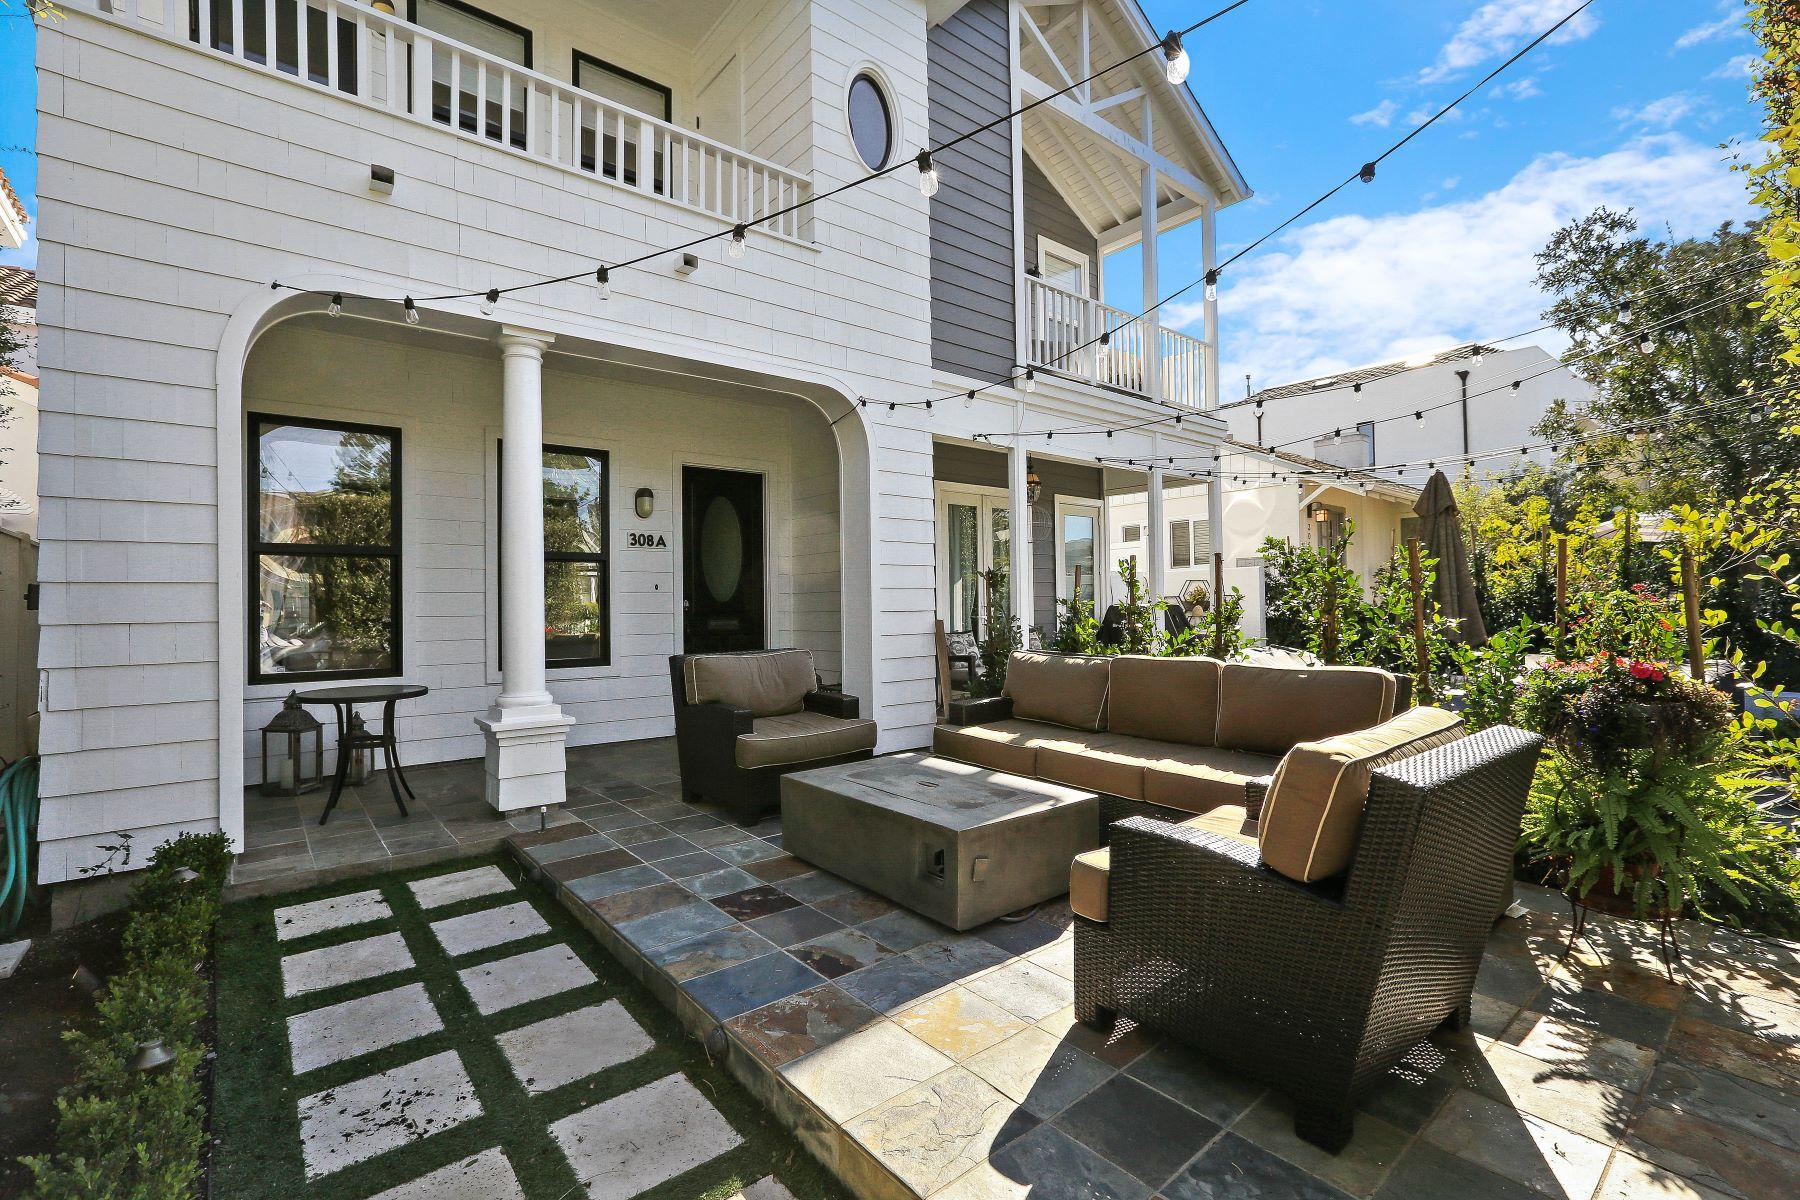 Single Family Homes for Active at 308 Iris Avenue Unit#A 308 Iris Ave # A Corona Del Mar, California 92625 United States